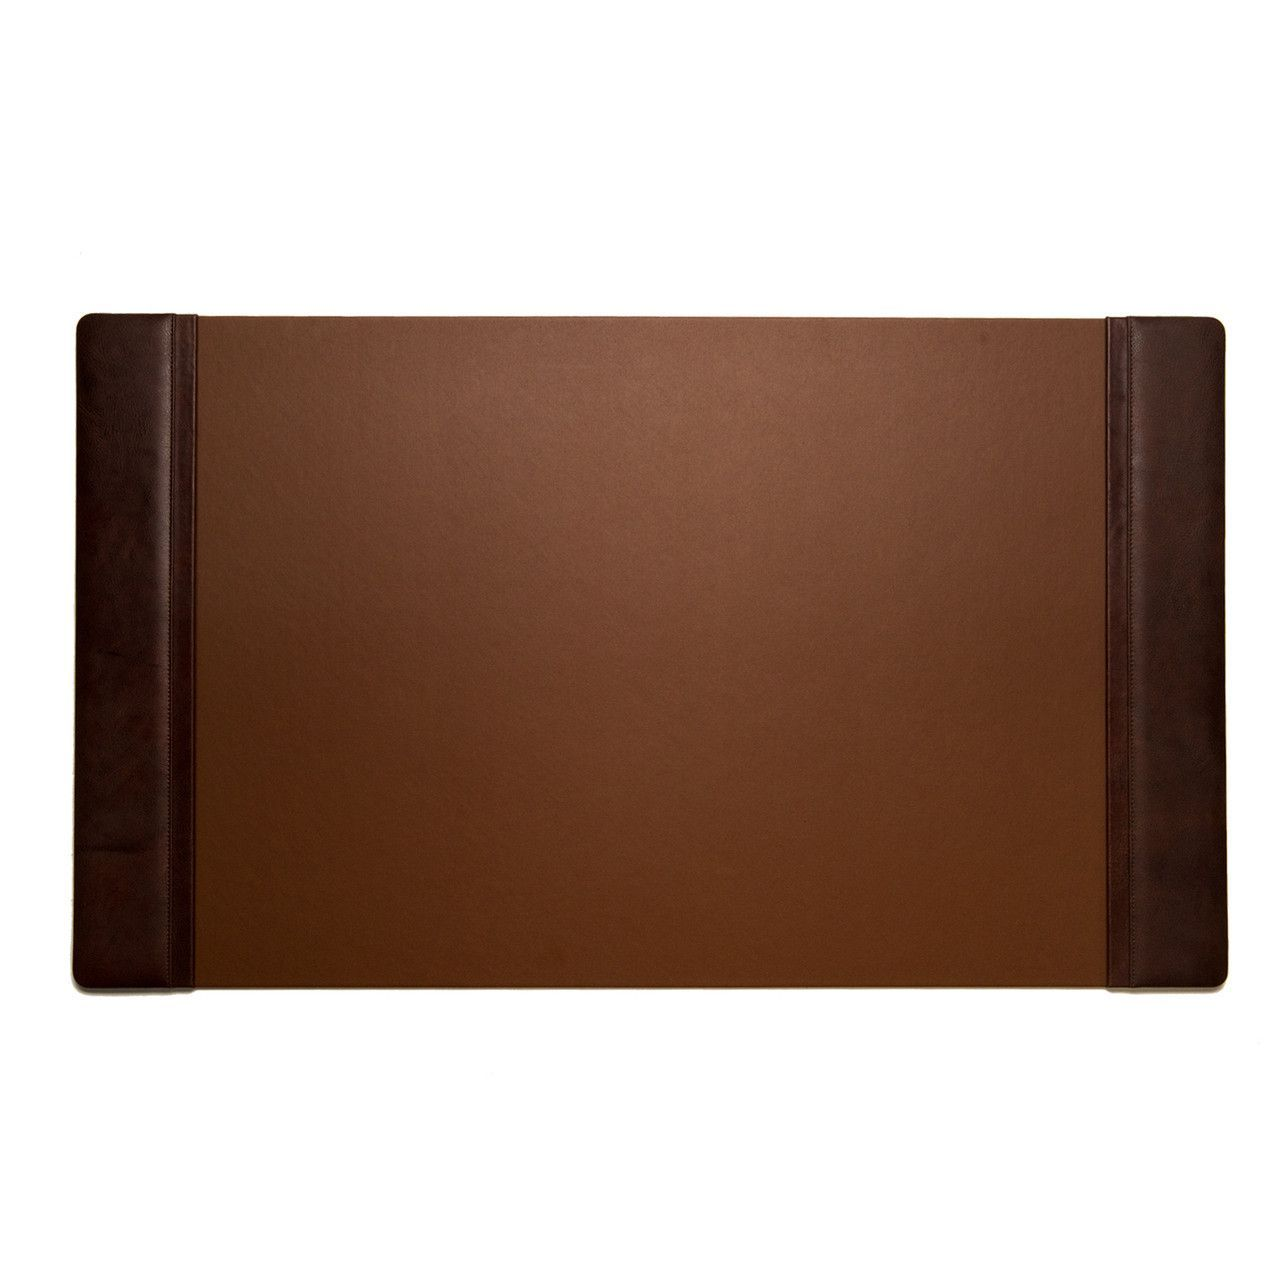 Bey Berk Tan Croco Leather Desk Pad